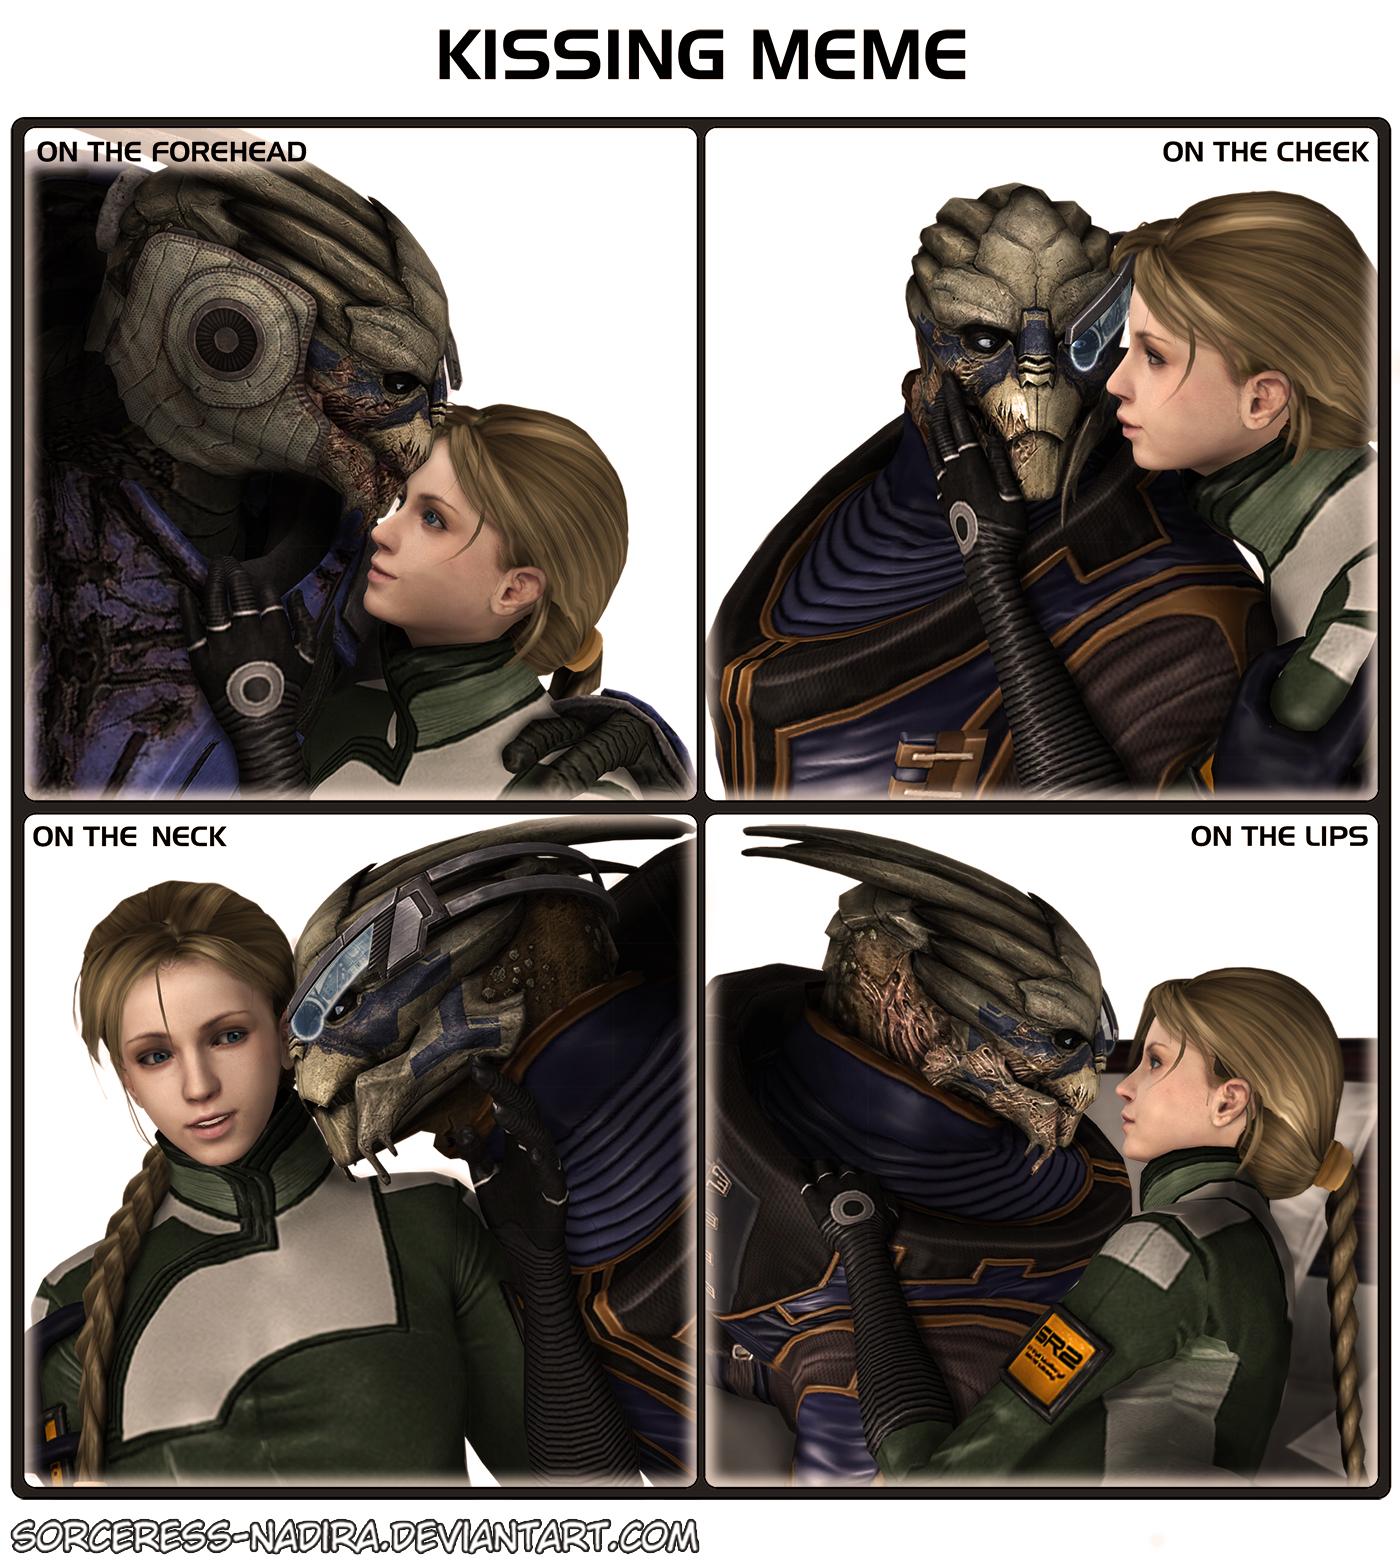 Kissing meme - Garrus and Danielle by Sorceress-Nadira